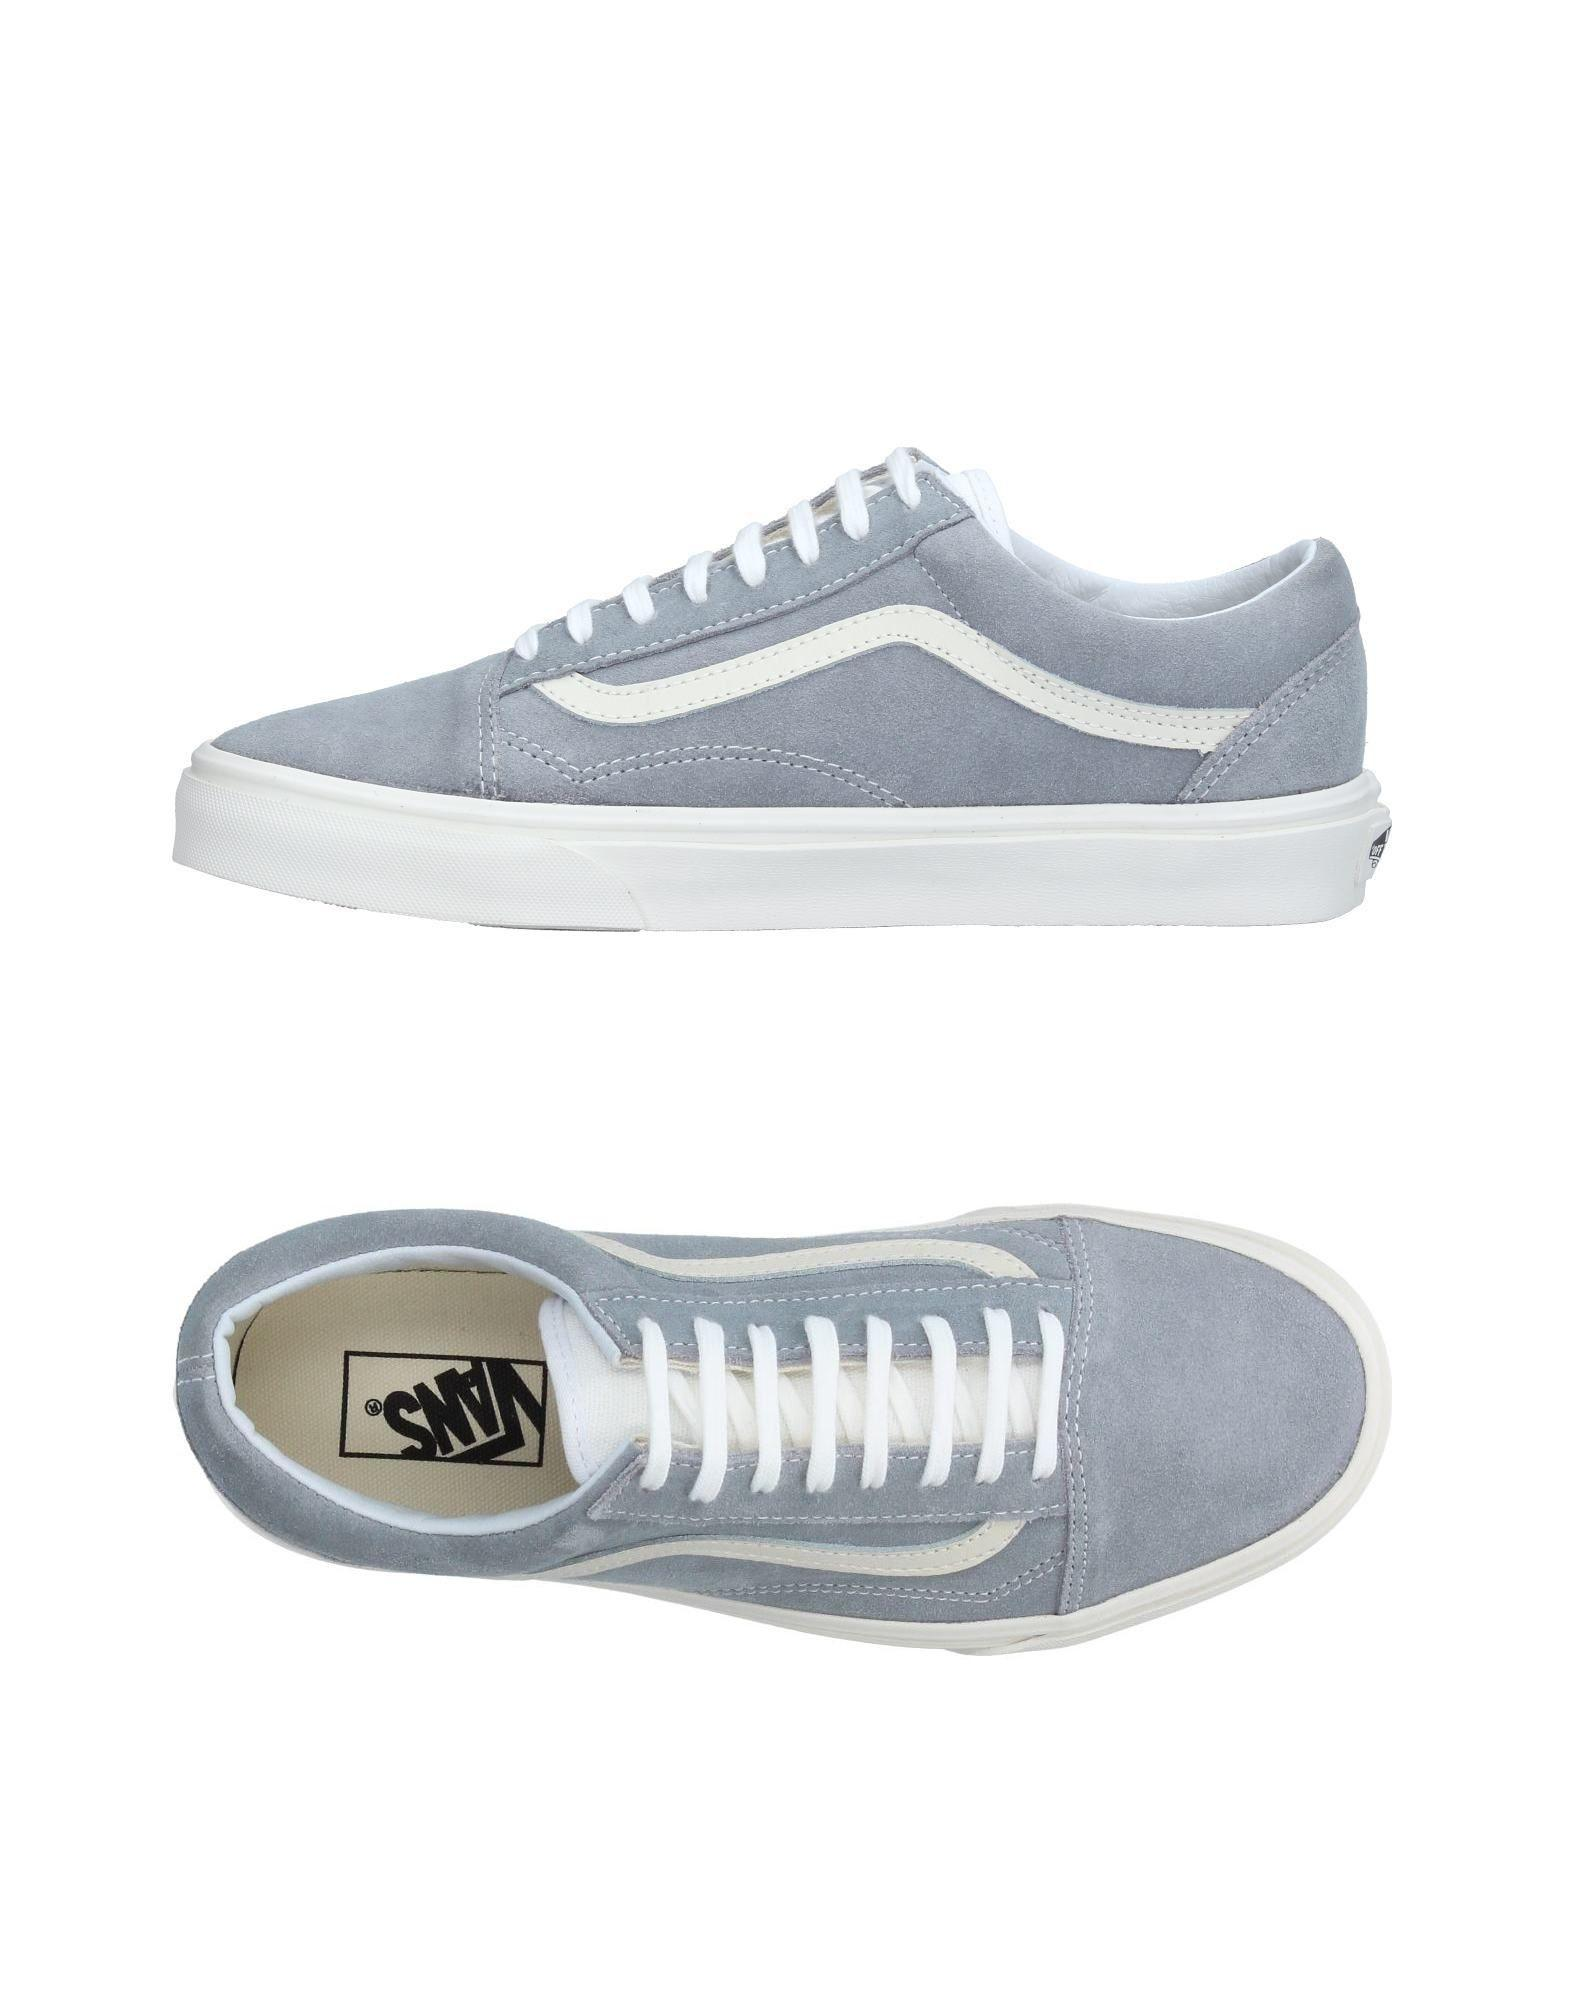 vans low tops sneakers in gray for men lyst. Black Bedroom Furniture Sets. Home Design Ideas